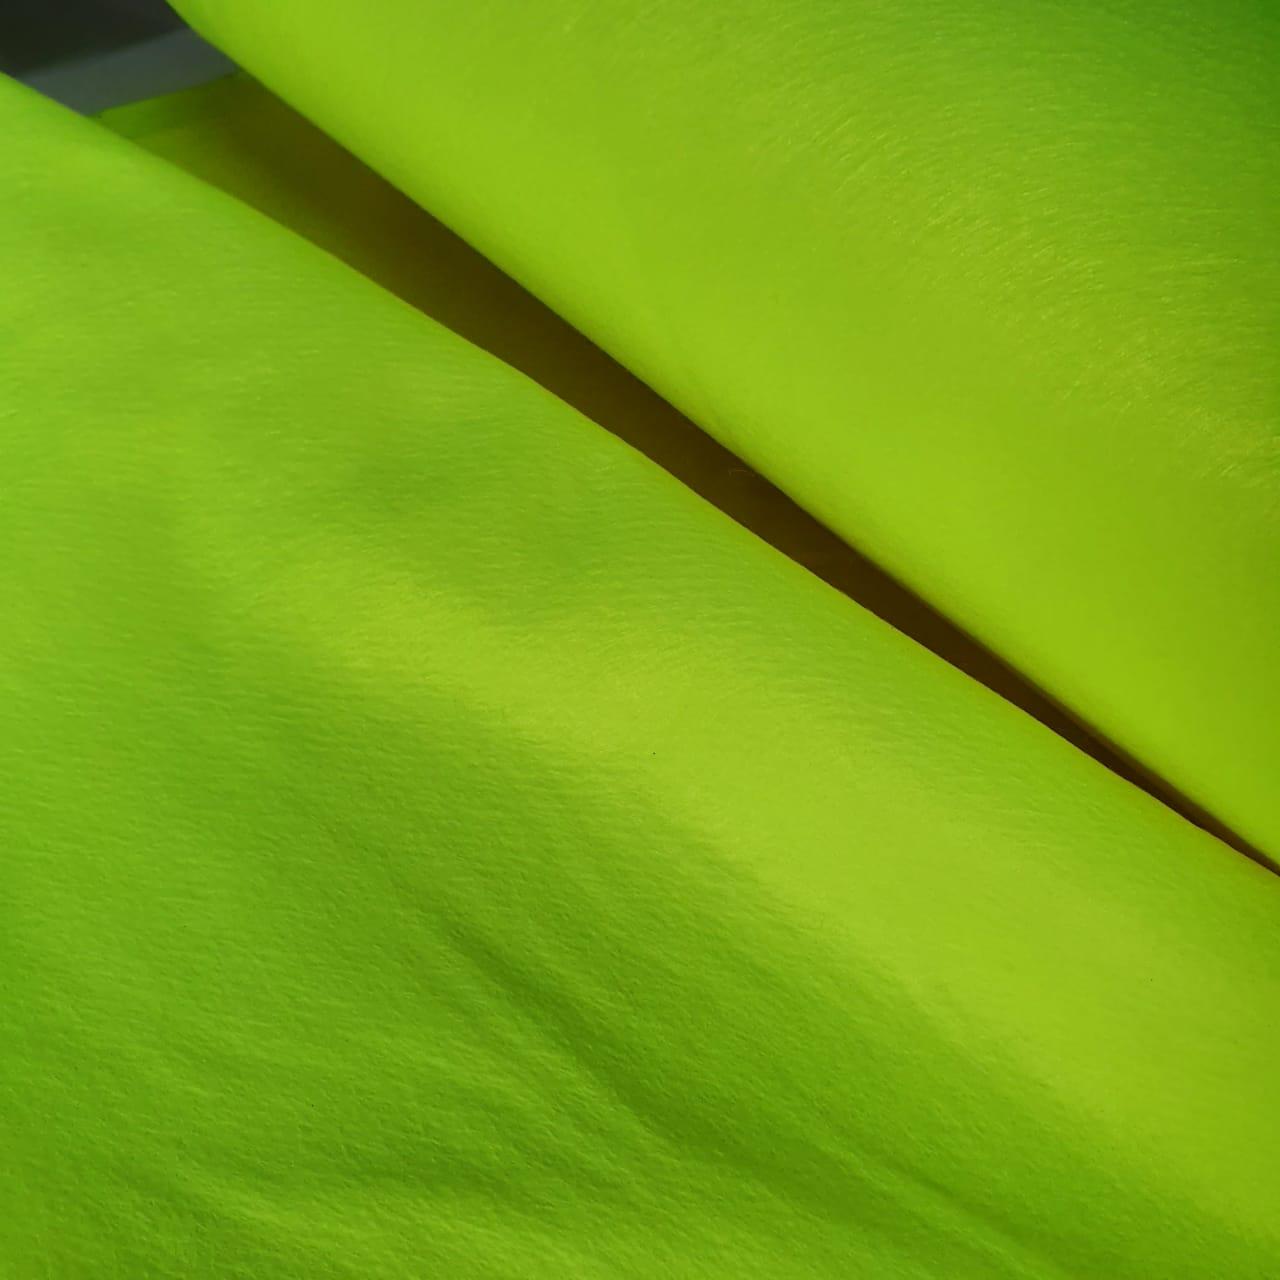 Feltro Verde Fluorescente Ober